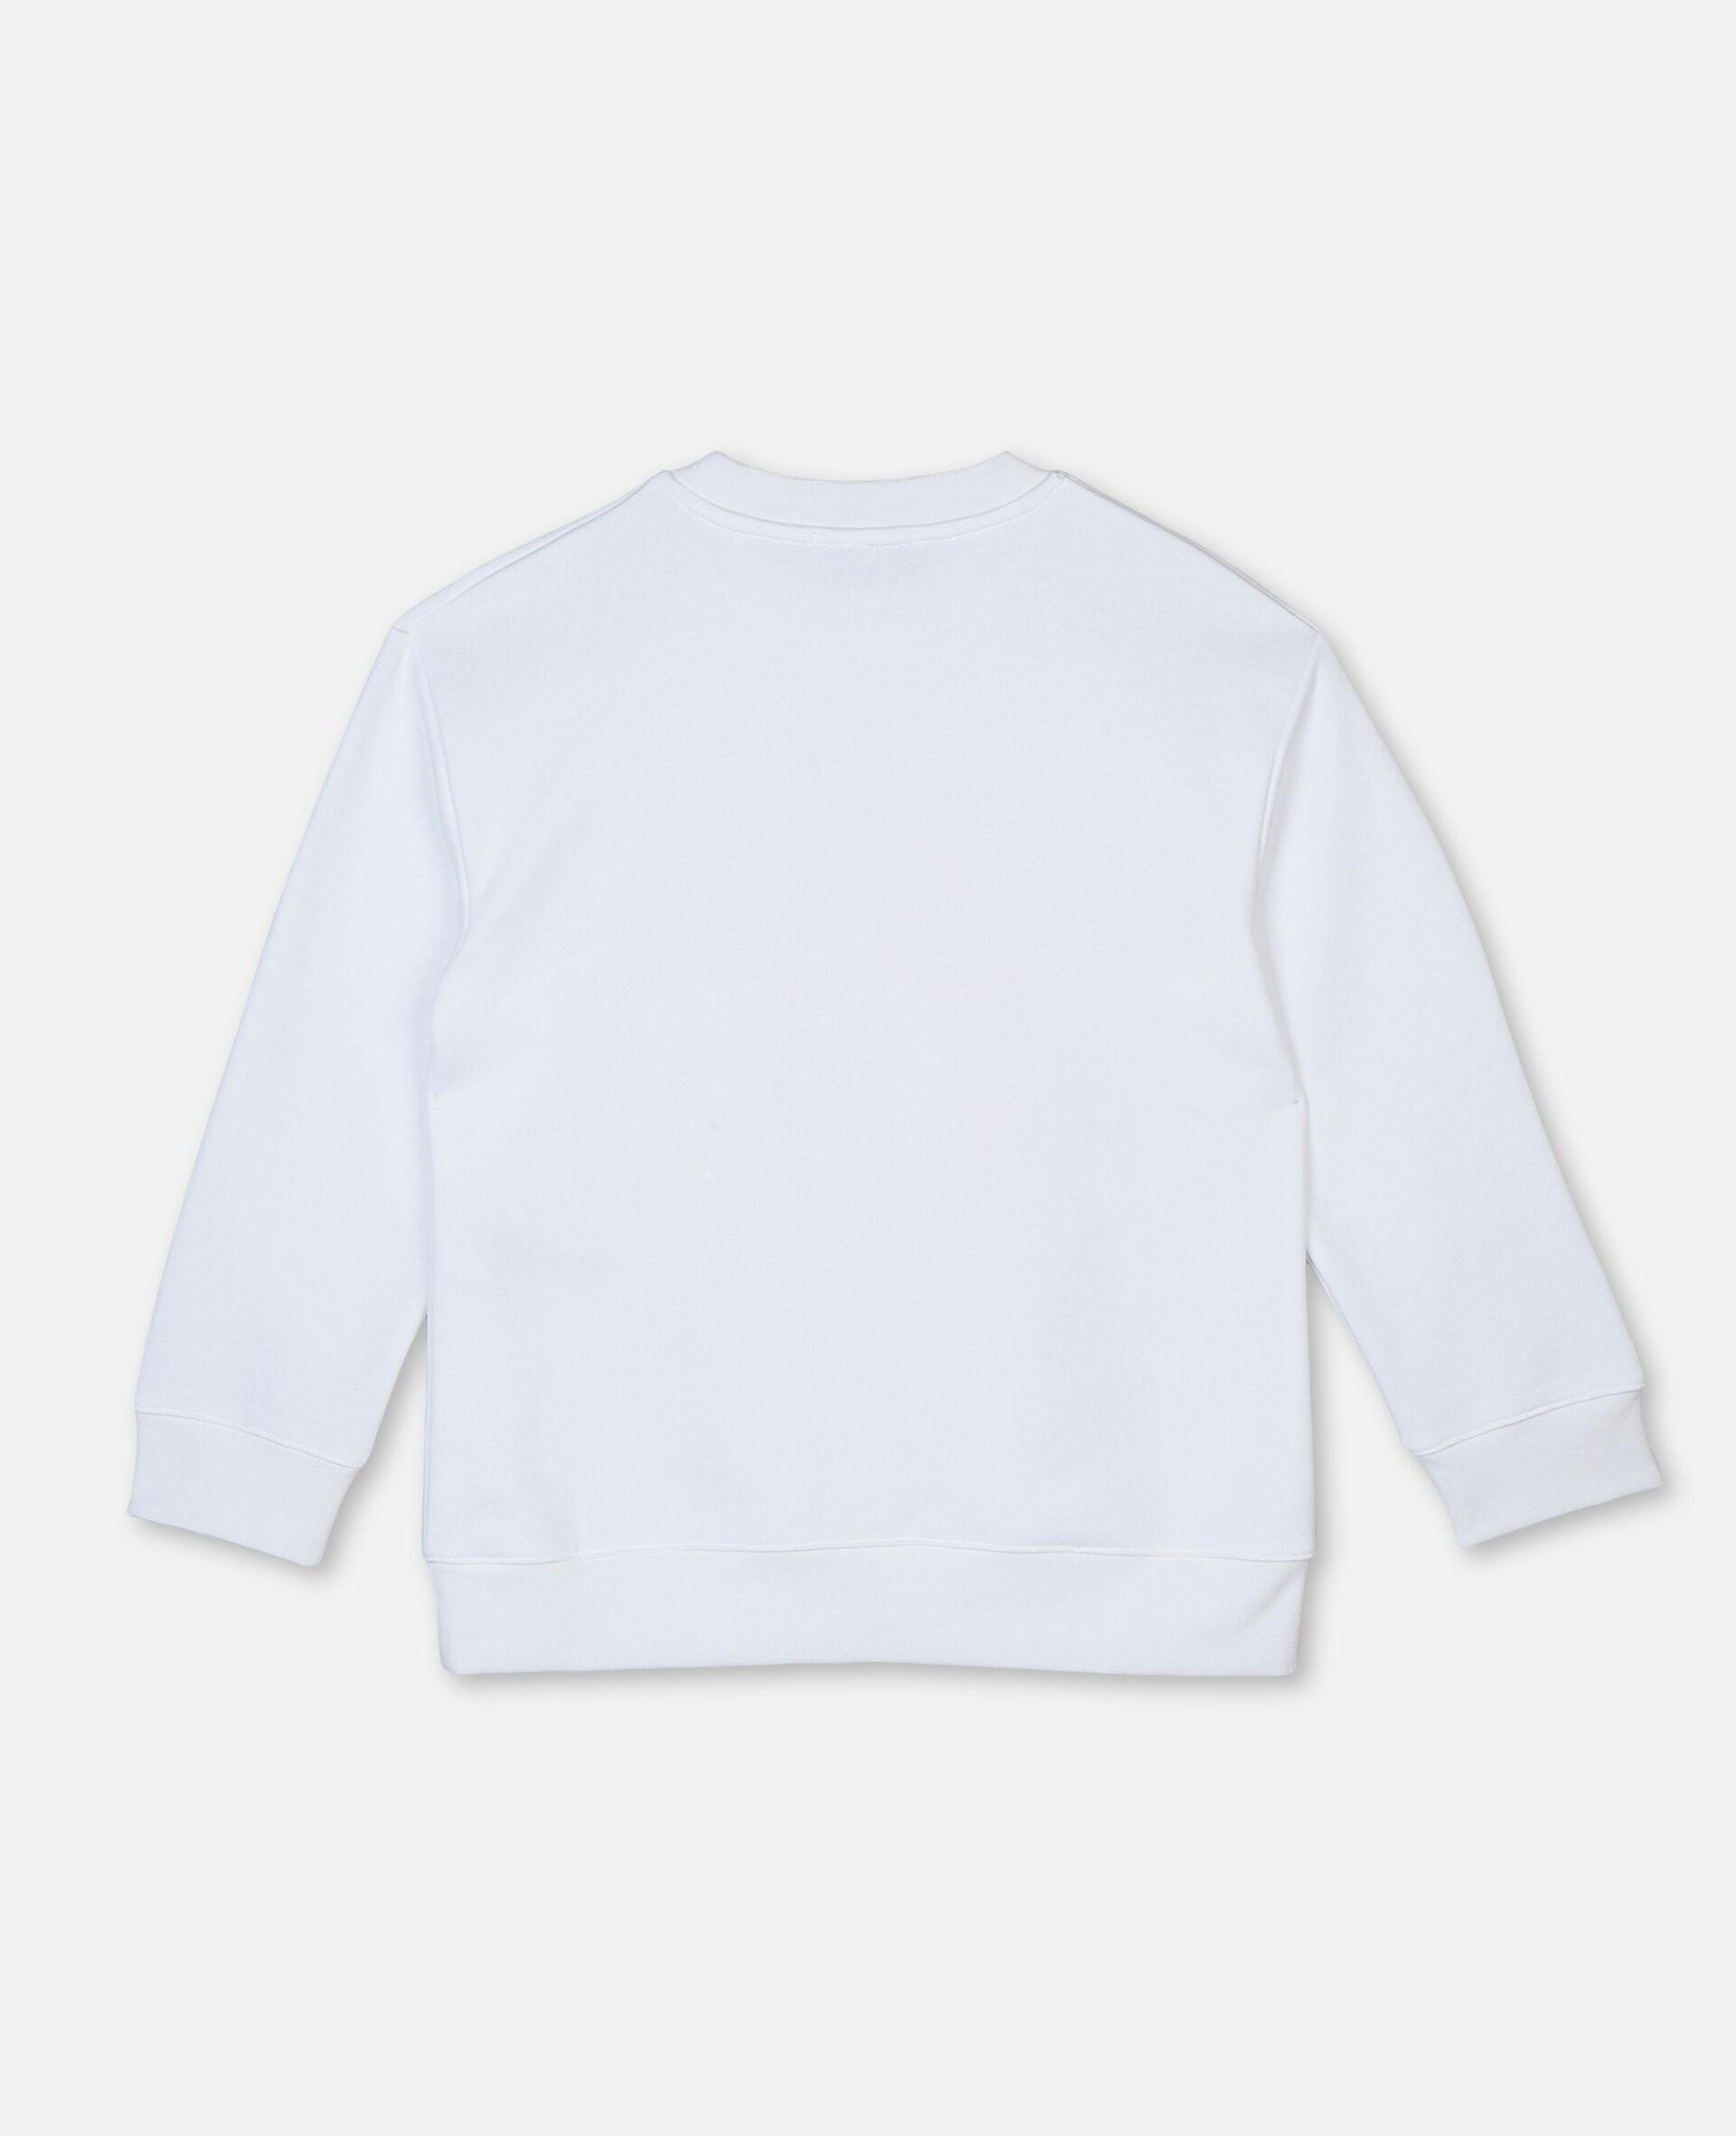 Felpa Oversize in Cotone con Logo Basket -Bianco-large image number 3